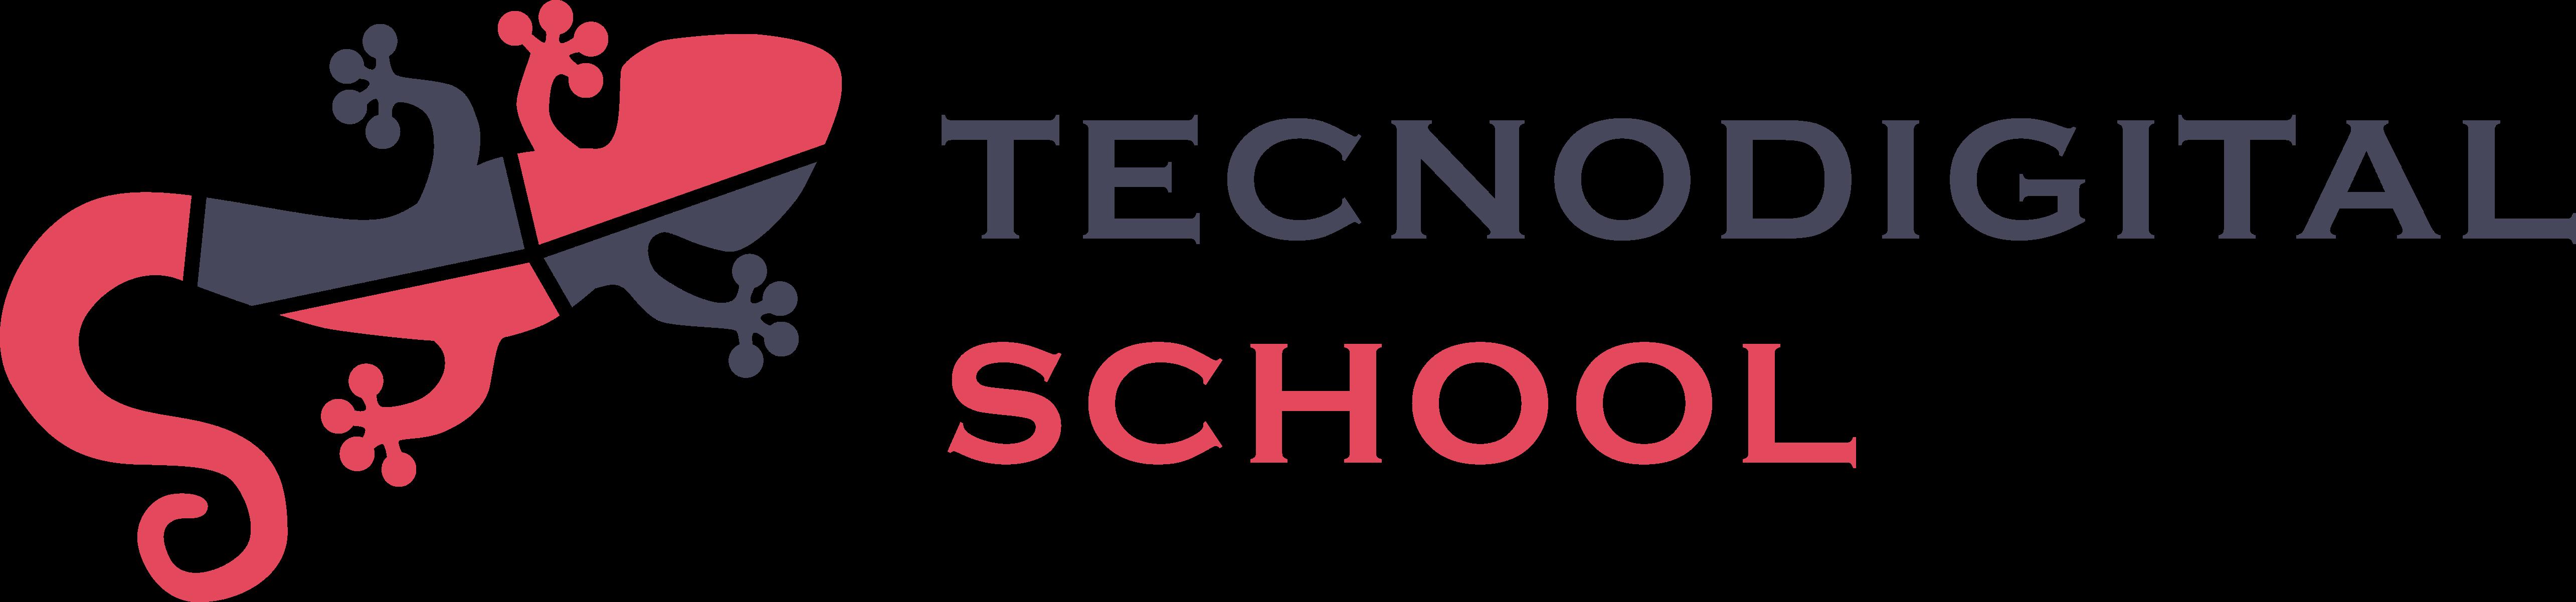 TecnoDigital School